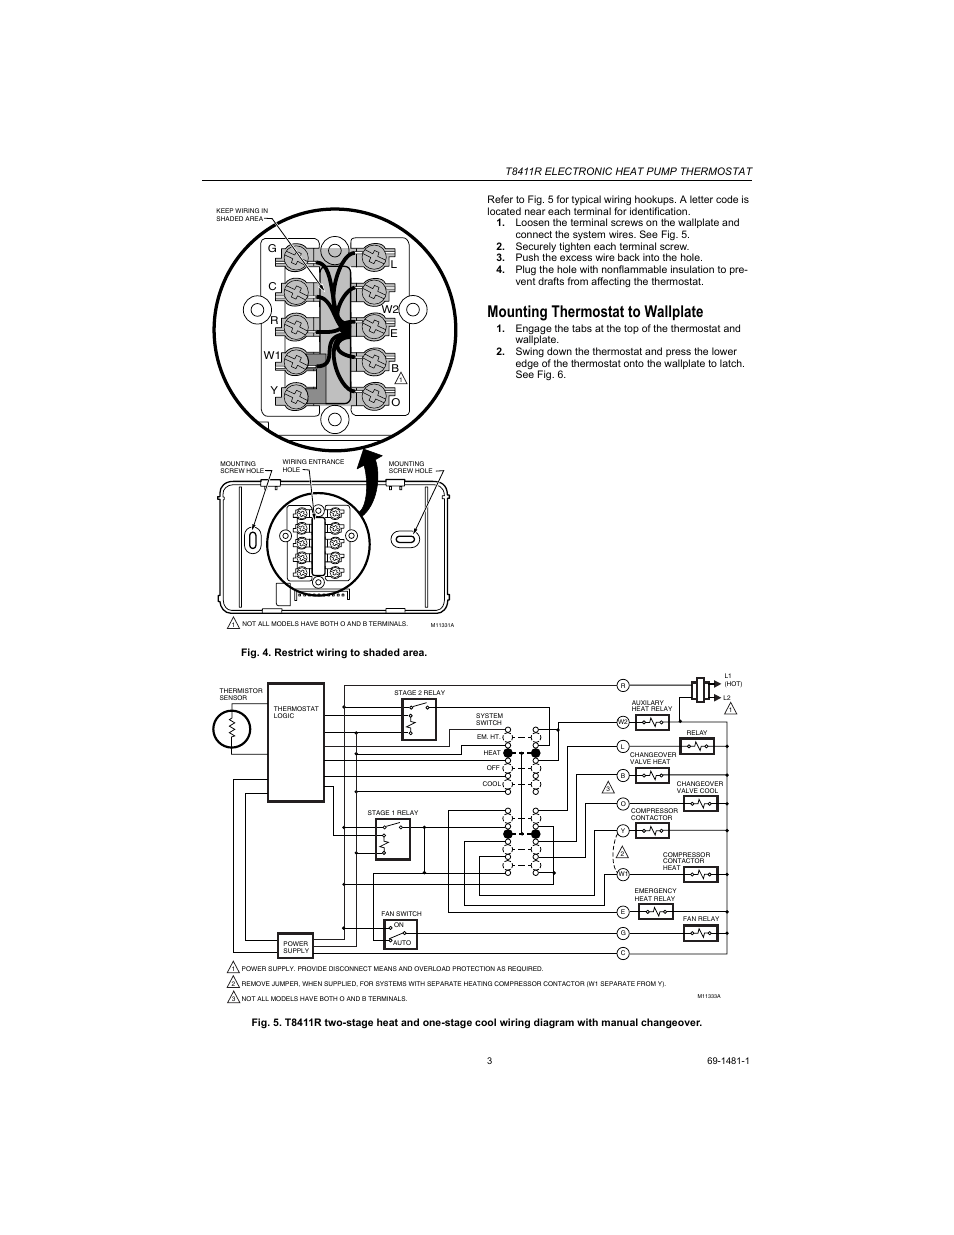 honeywell t8411r thermostat wiring diagram   42 wiring